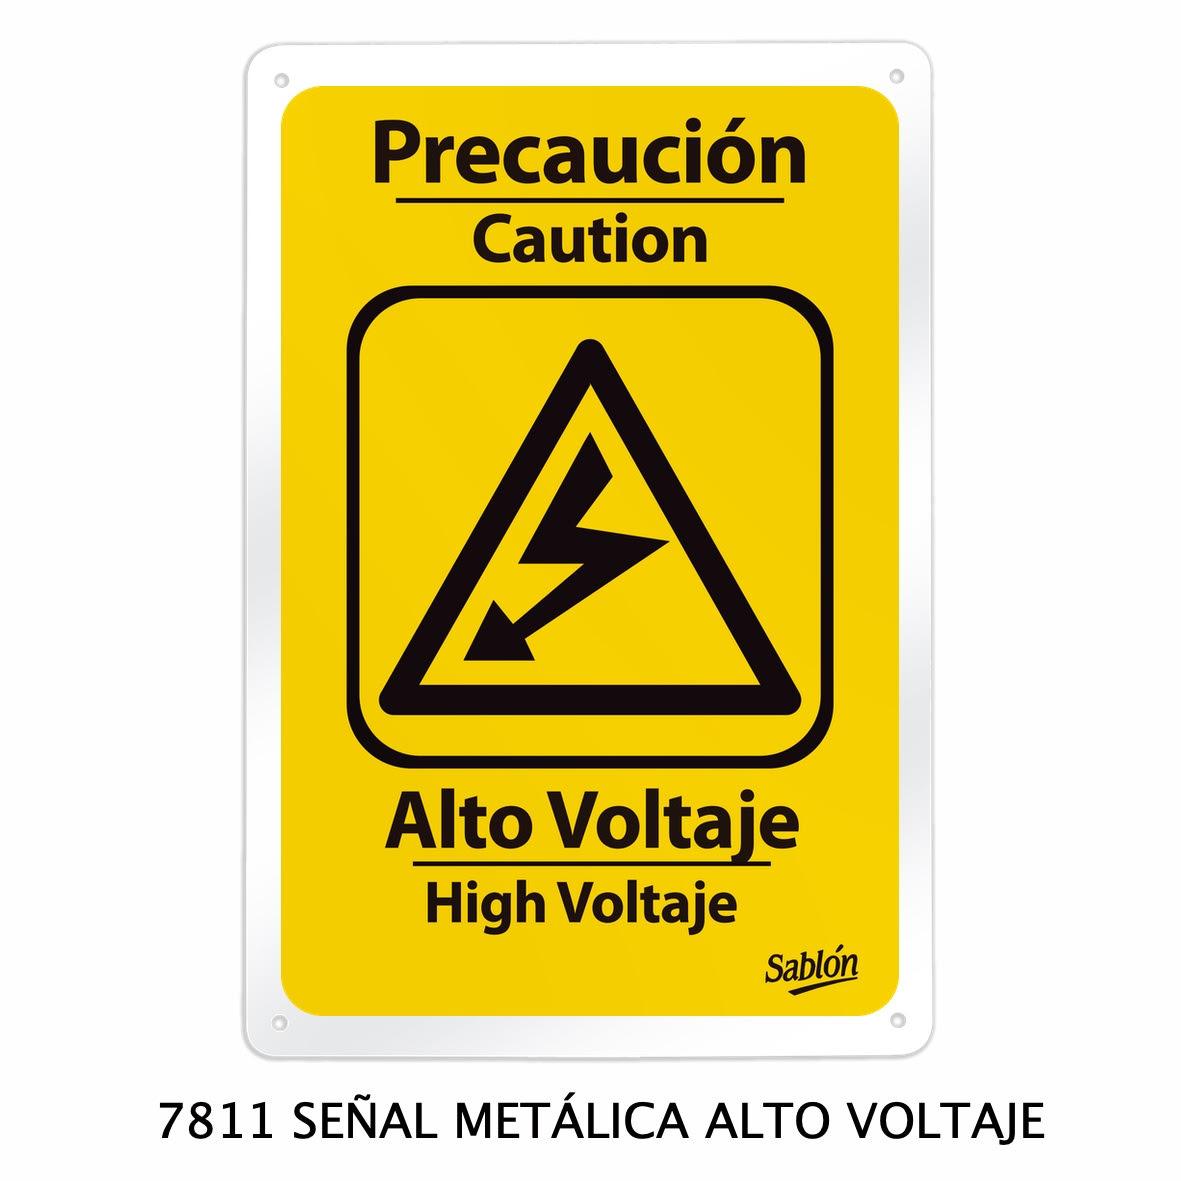 Señal metálica de alto voltaje modelo 7811 de Sablón